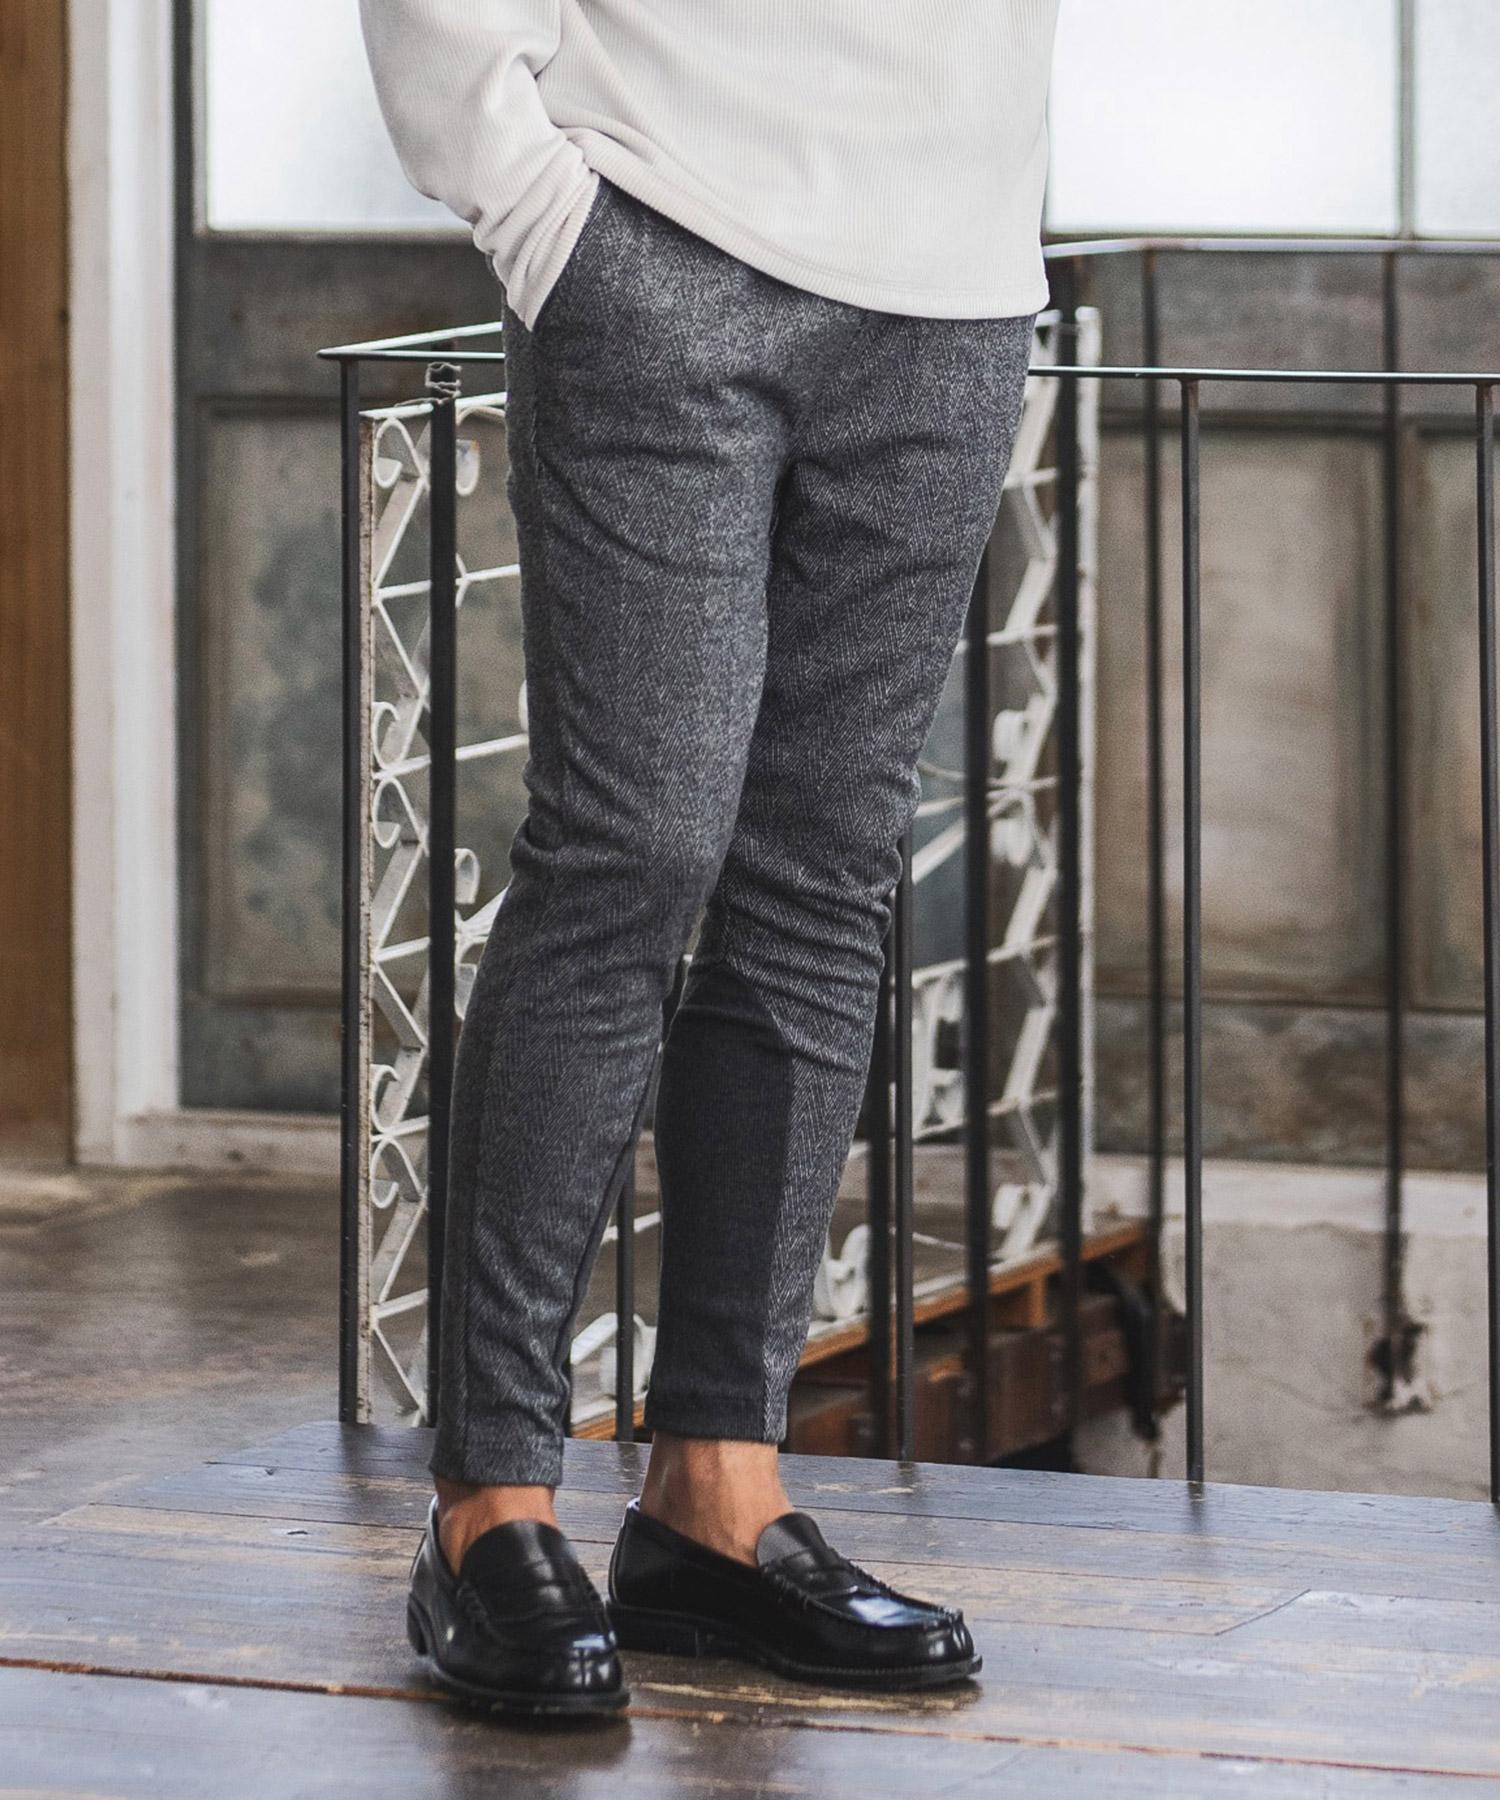 【CAMBIO(カンビオ)】【予約販売10月中旬~下旬入荷】Ponti Herringbone Jacquard Hem Rib Pants パンツ